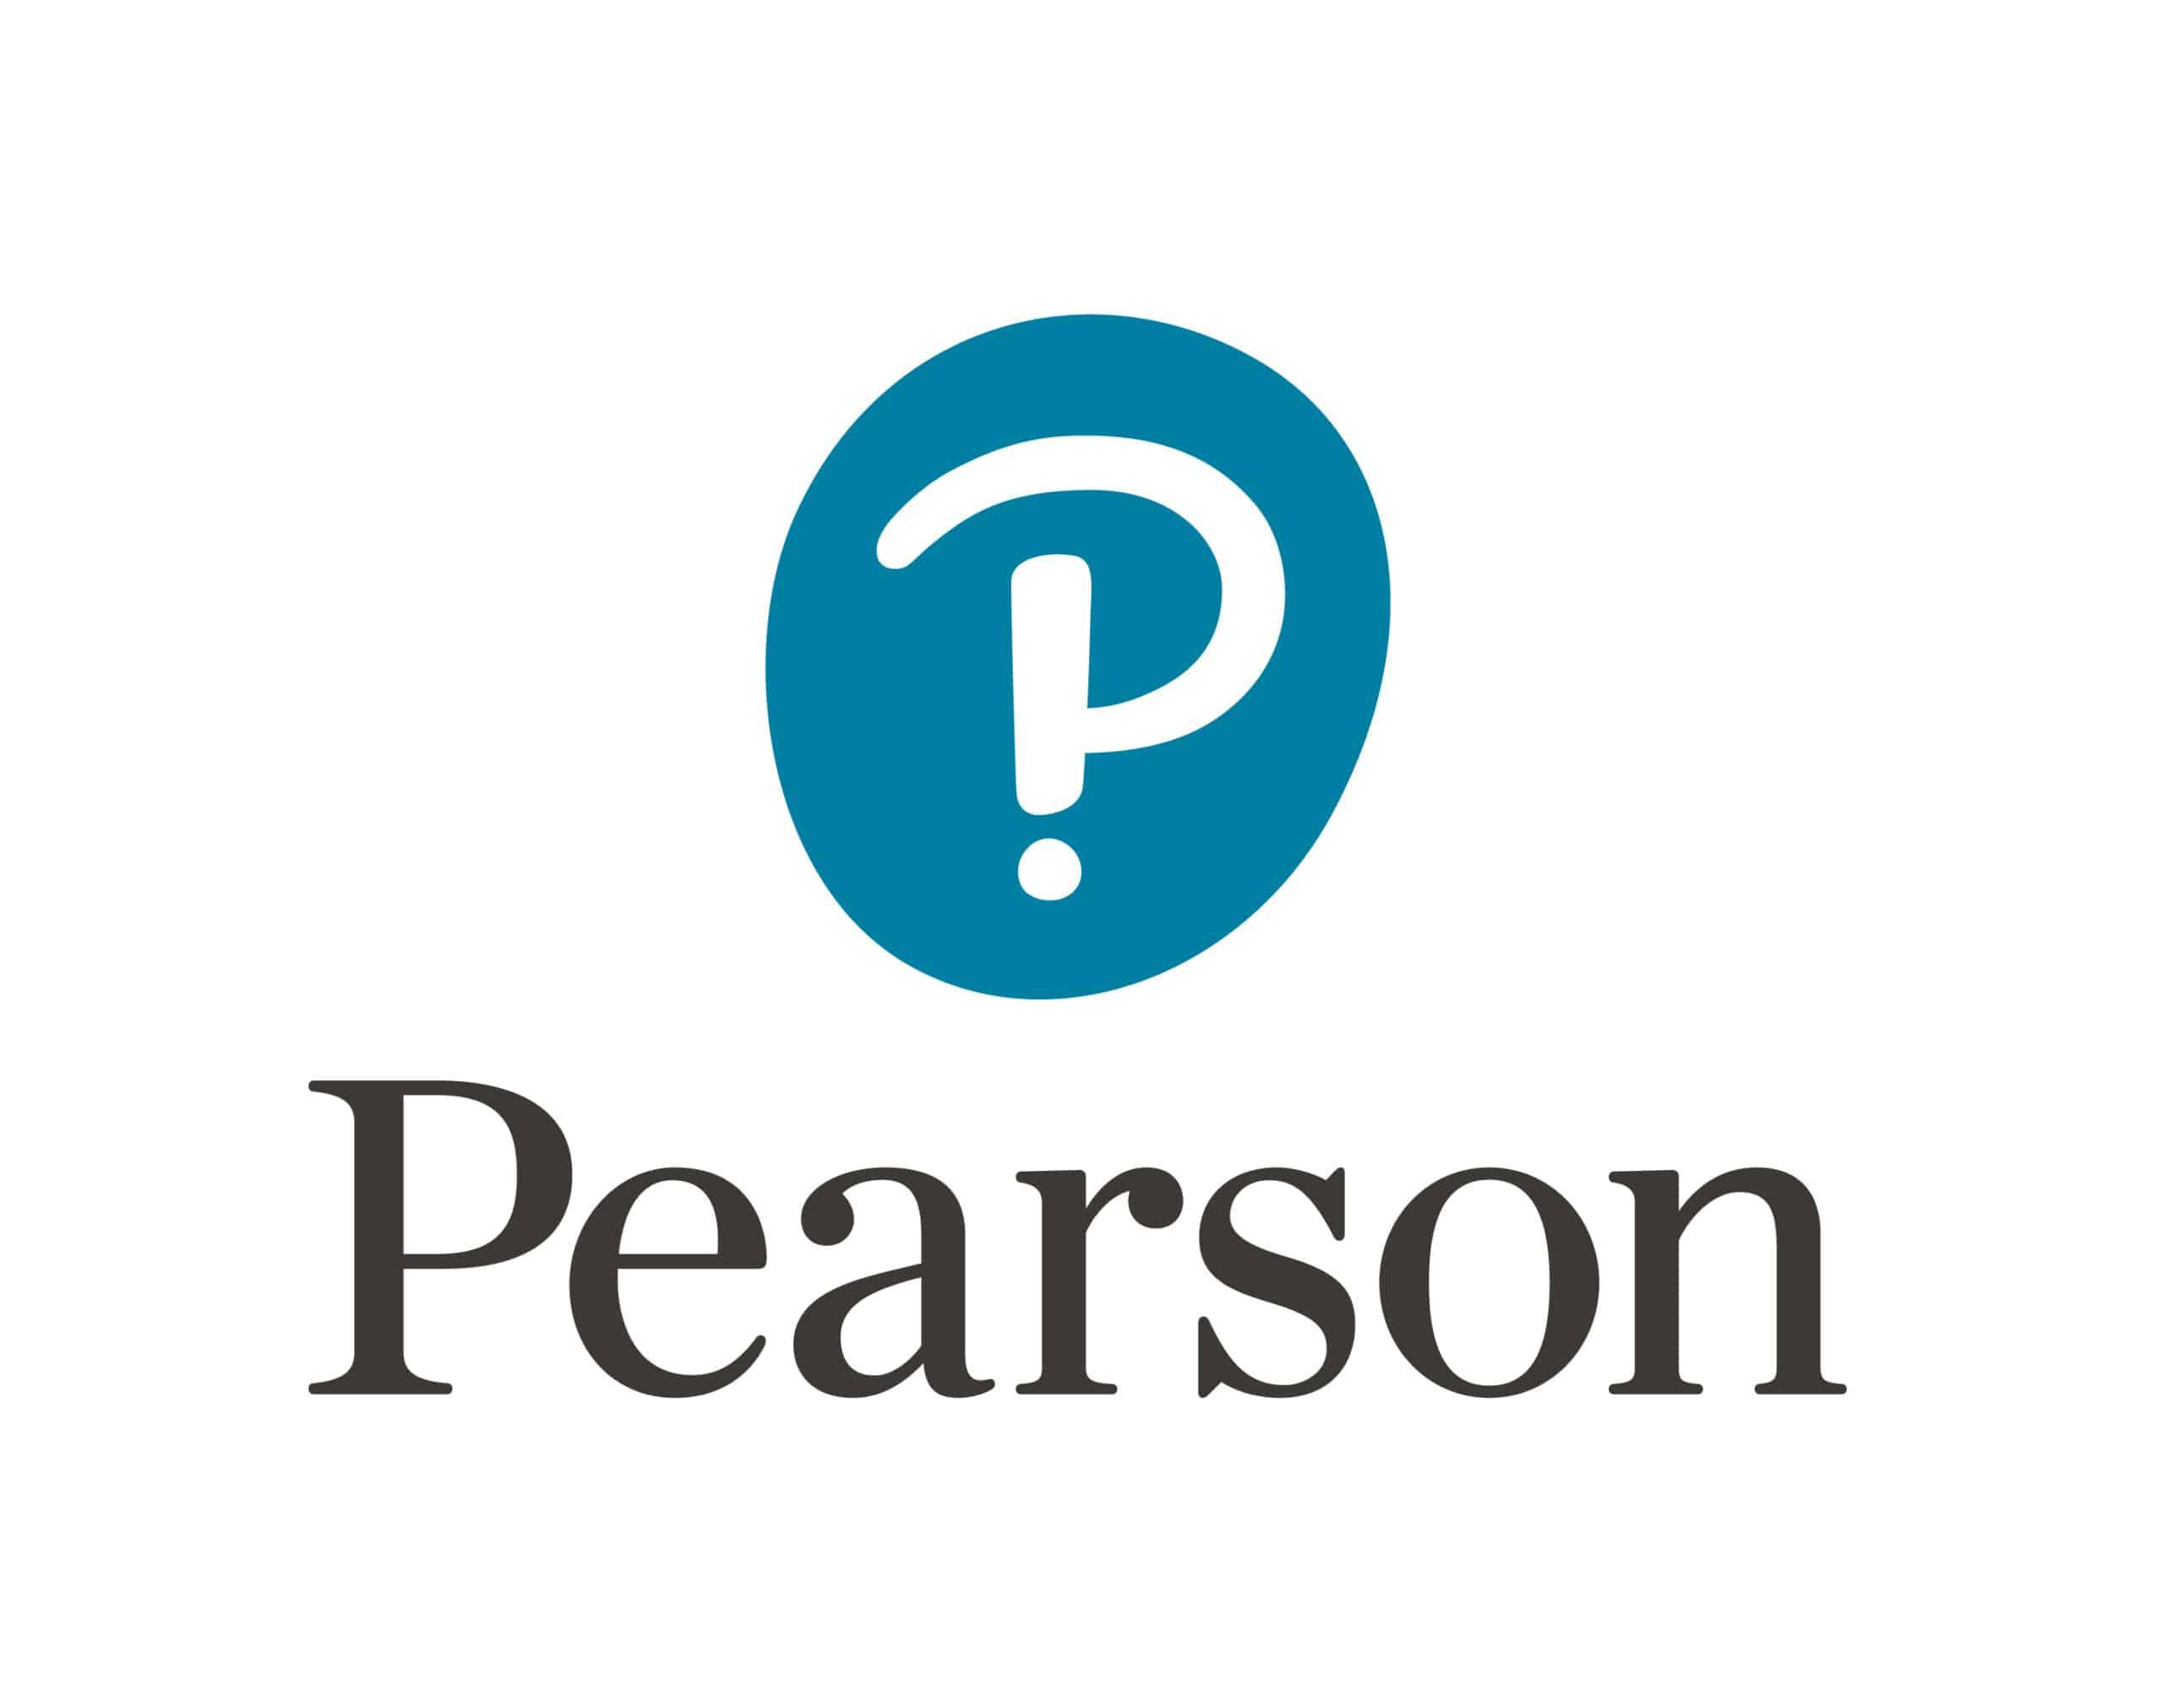 Pearson Online & Blended Learning